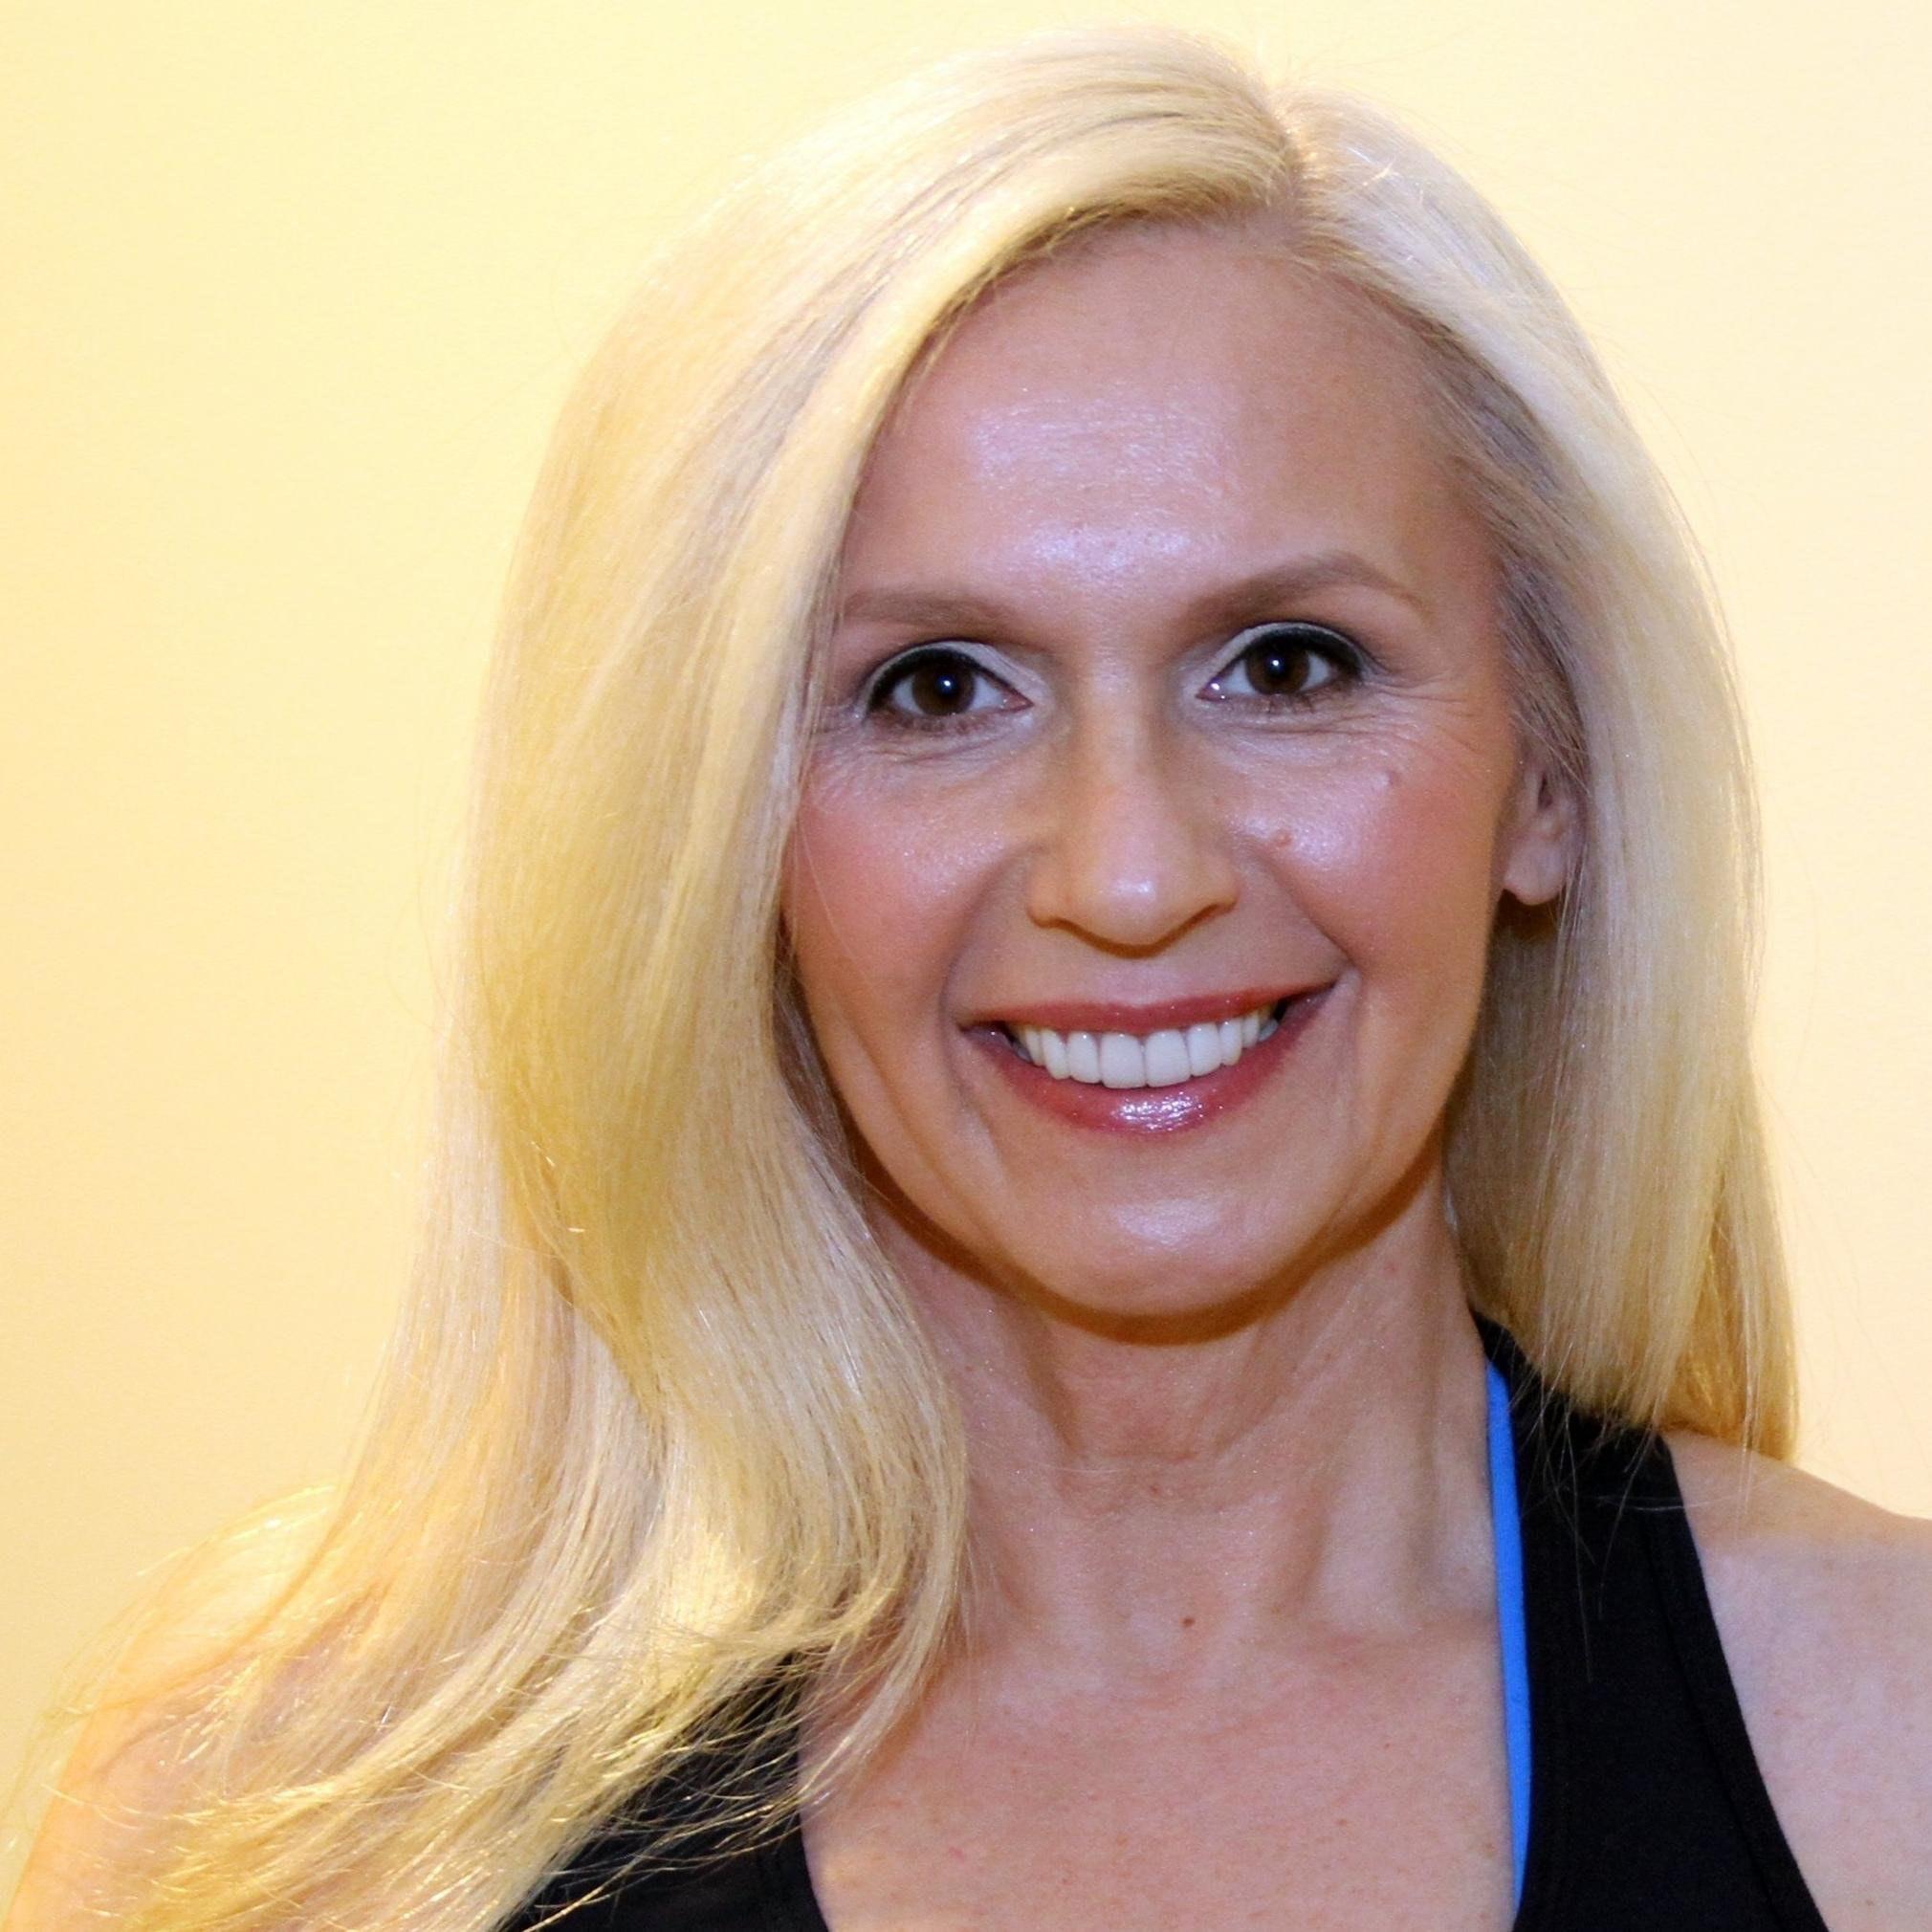 Mariana Danilovic